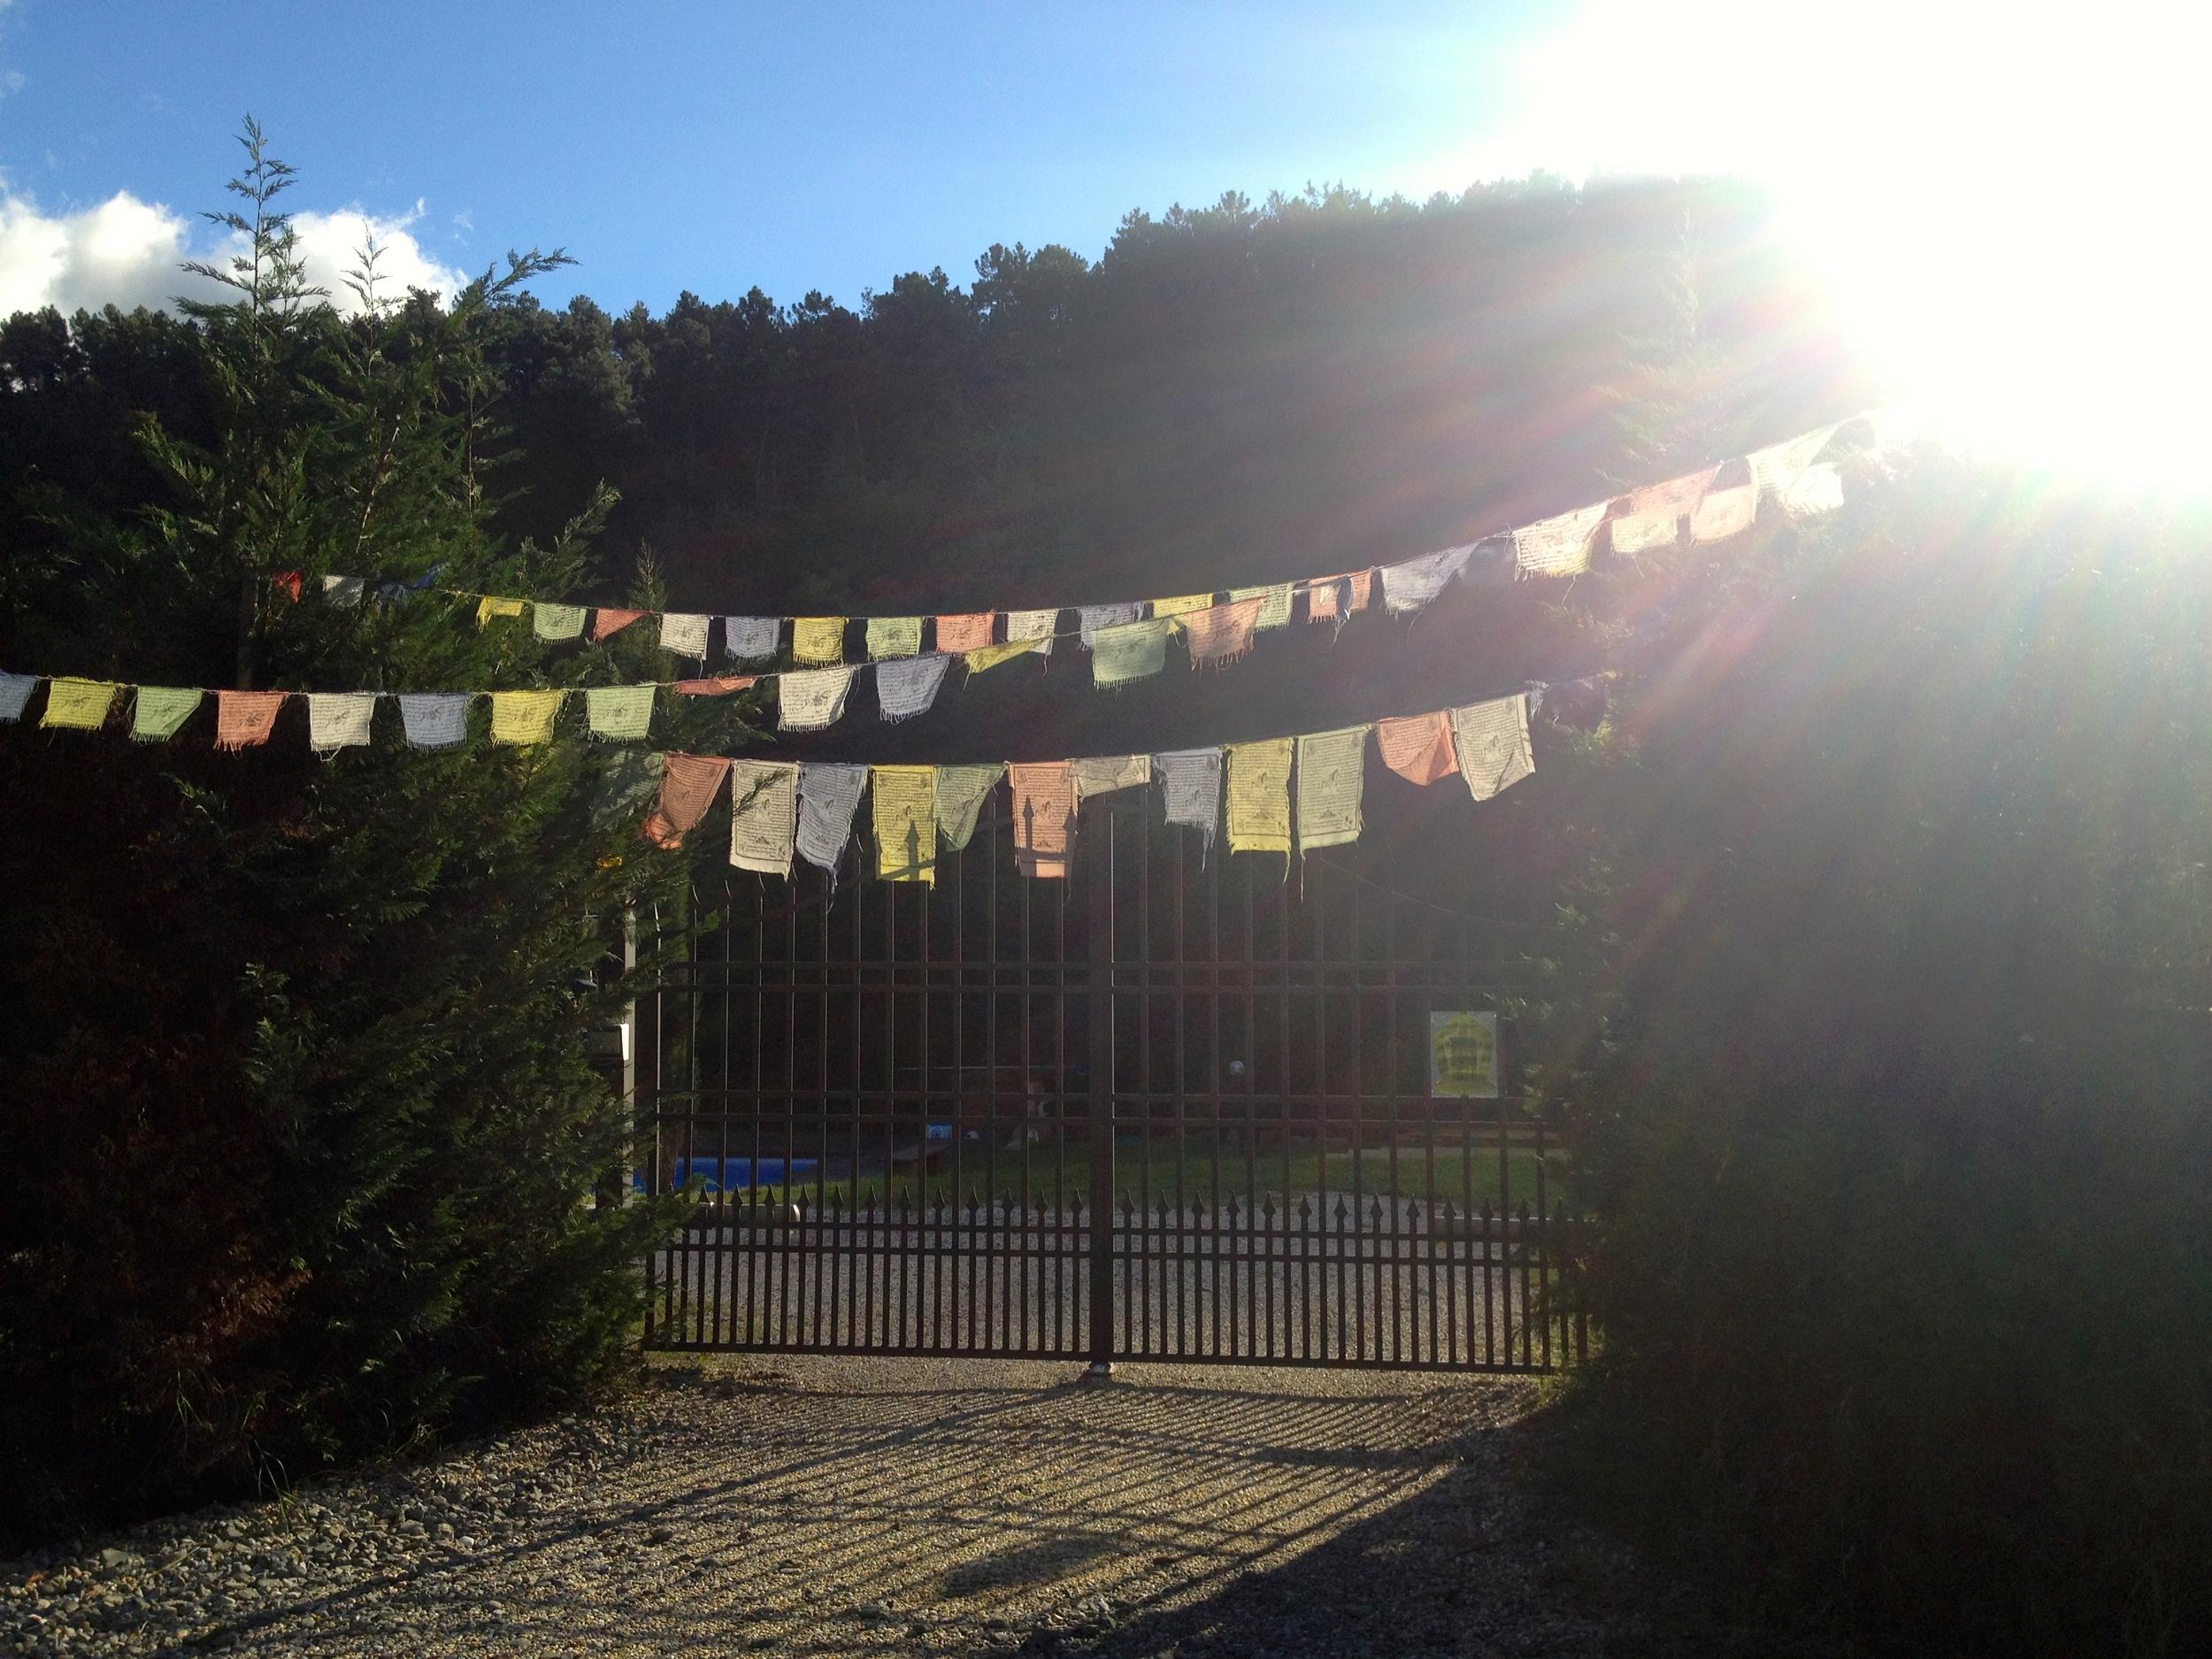 Tibetan prayer flags outside a property along the Via Francigena near Lucca, Italy